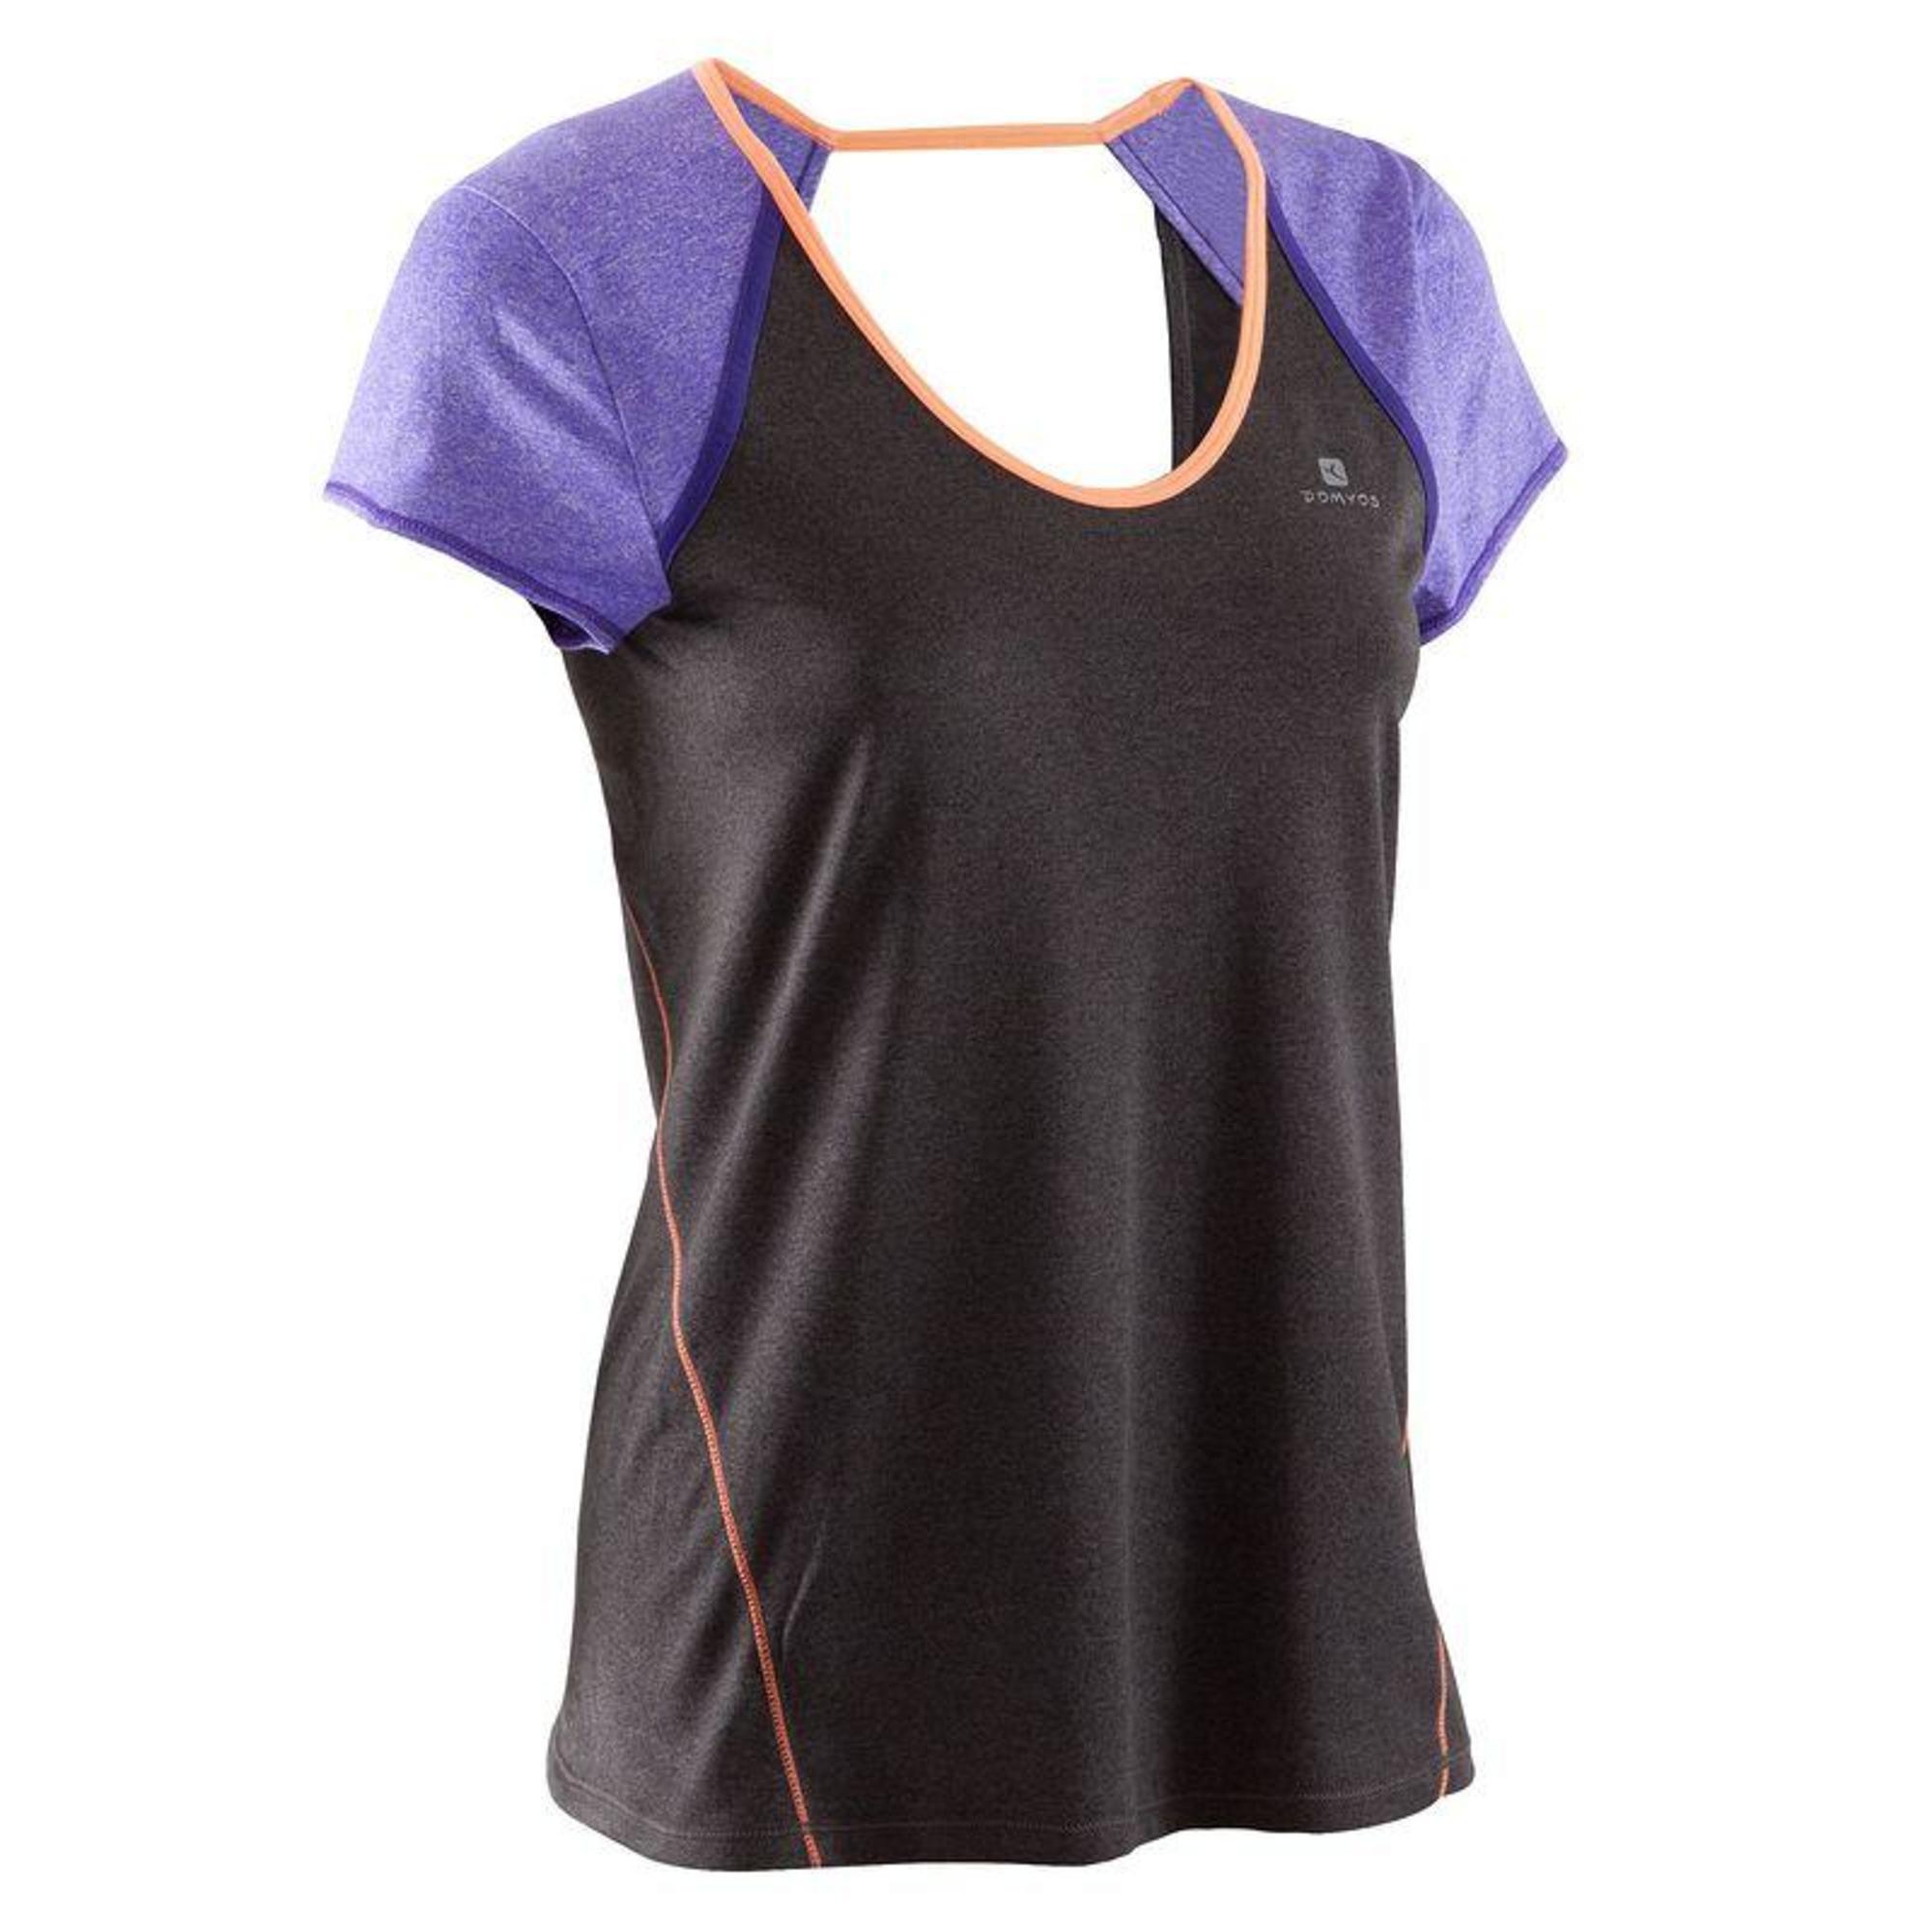 tee shirt breathe gris fonc violet fitness femme domyos by decathlon. Black Bedroom Furniture Sets. Home Design Ideas